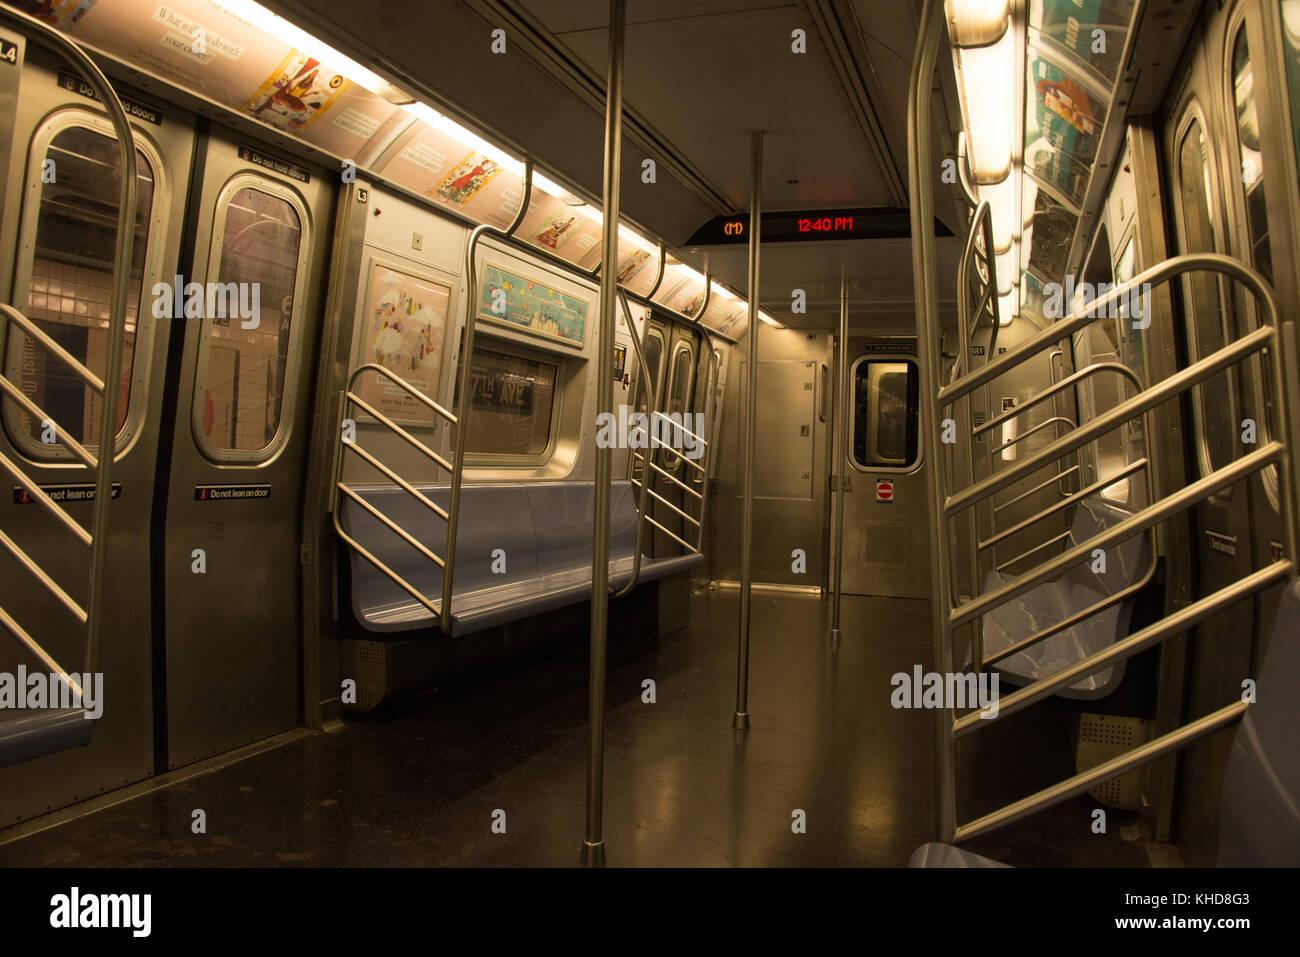 f train stock photos f train stock images alamy. Black Bedroom Furniture Sets. Home Design Ideas